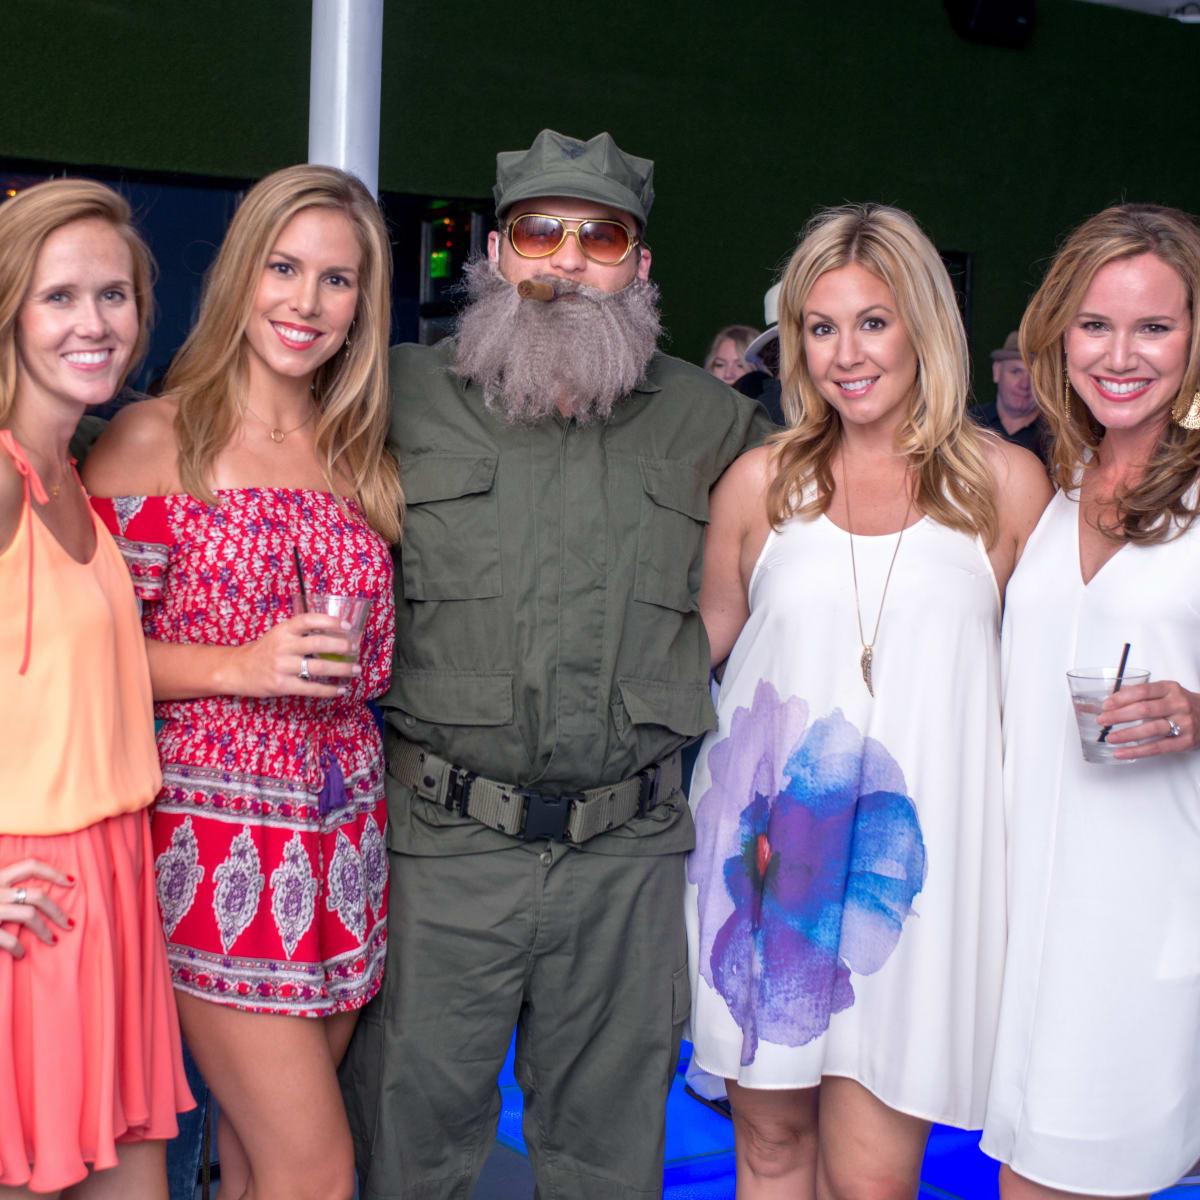 Havana Night, 7/16 Hannah Lonergan, Lauren Dupuis, David King, Kathryn Birdwell, Stacy Andell